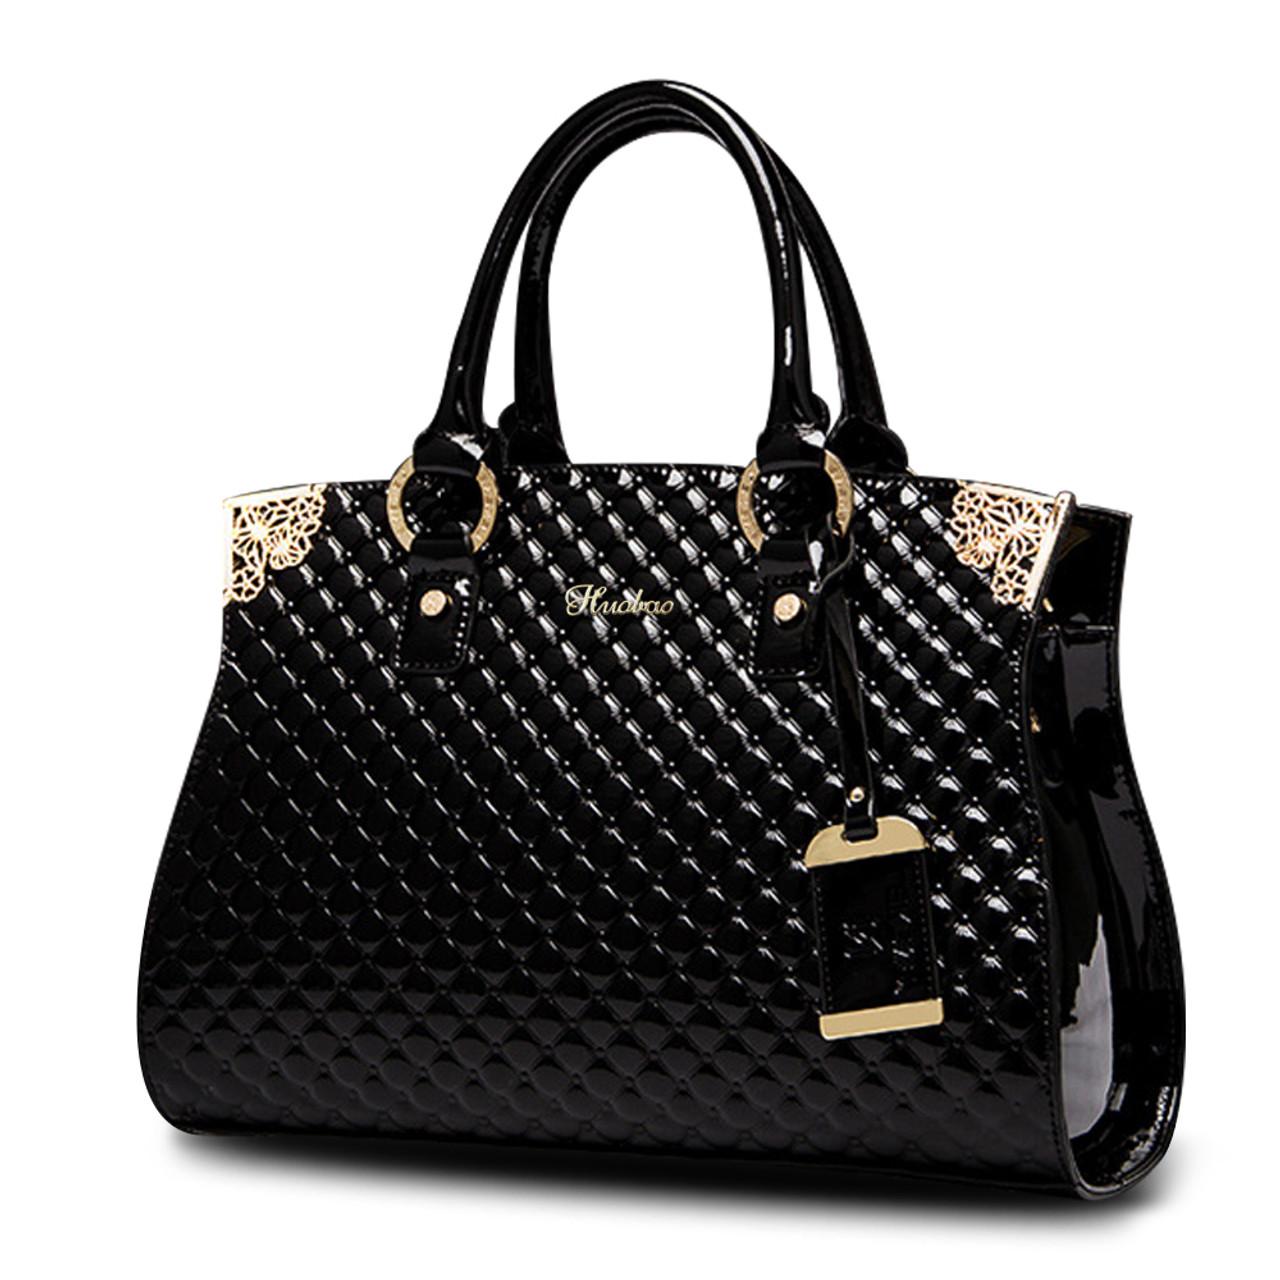 b1c80ea18b ... Women Genuine Patent Leather Handbags luxury Shoulder Crossbody Bag  Handbag Designer Purse Satchel Messenger Bag Ladies ...